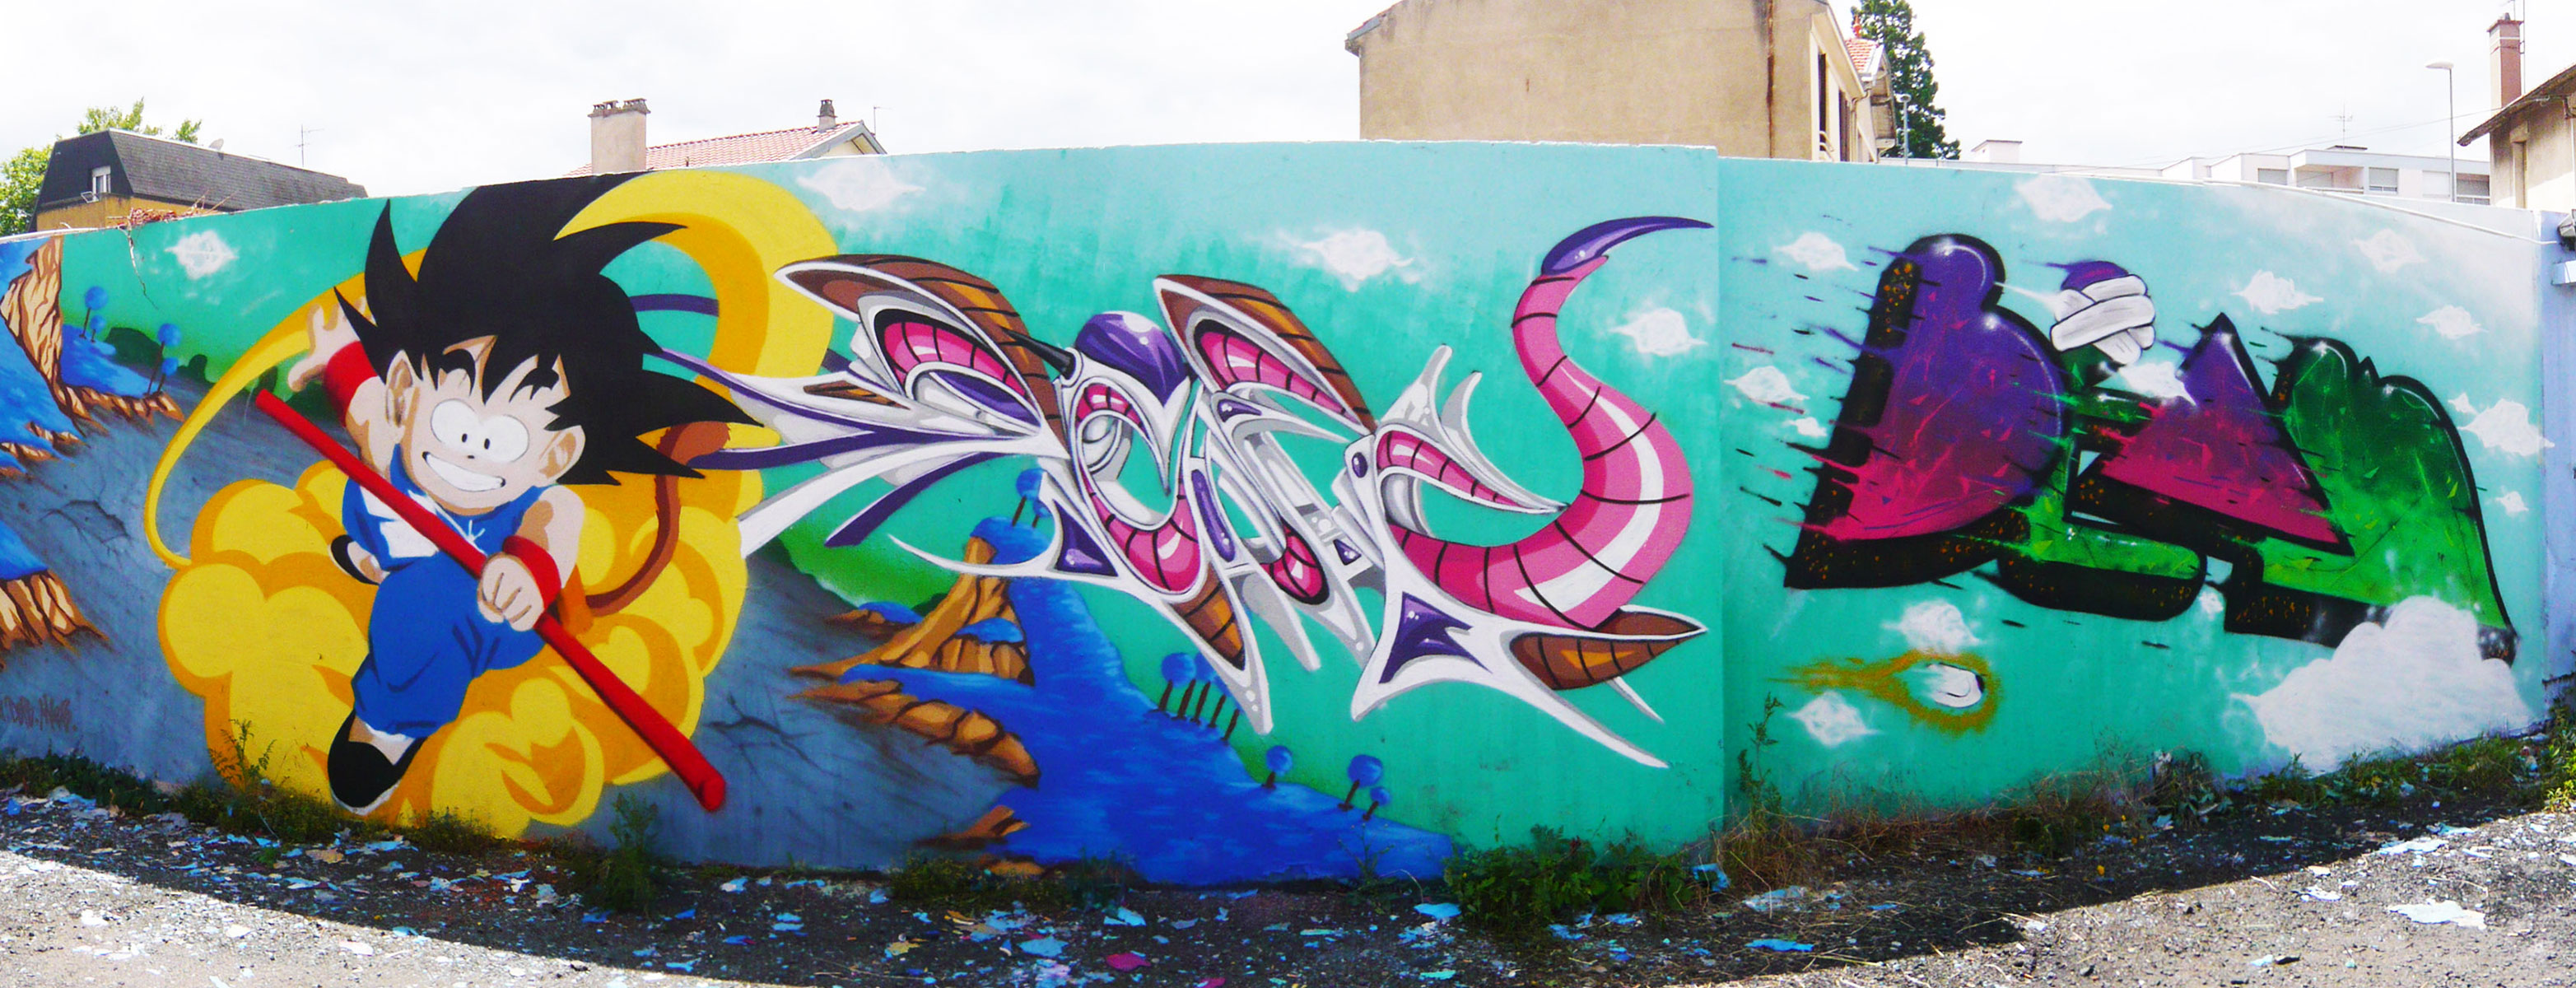 dargon_ball_graffiti_1